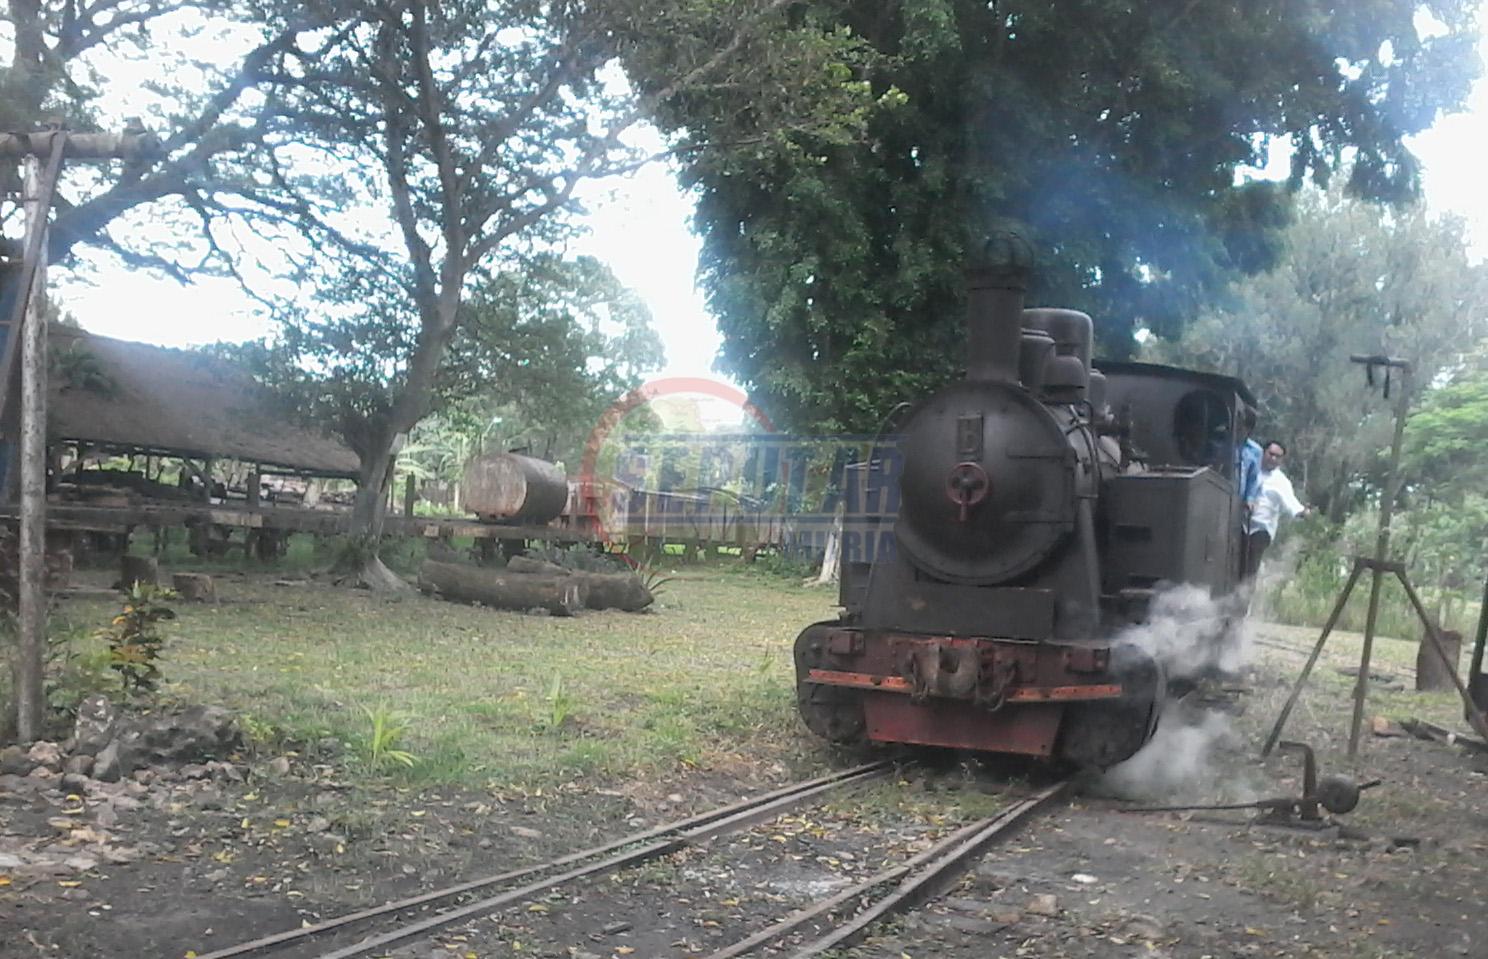 Seputar Muria News Wisata Loco Tour Kereta Kuno Dibuka Cepu